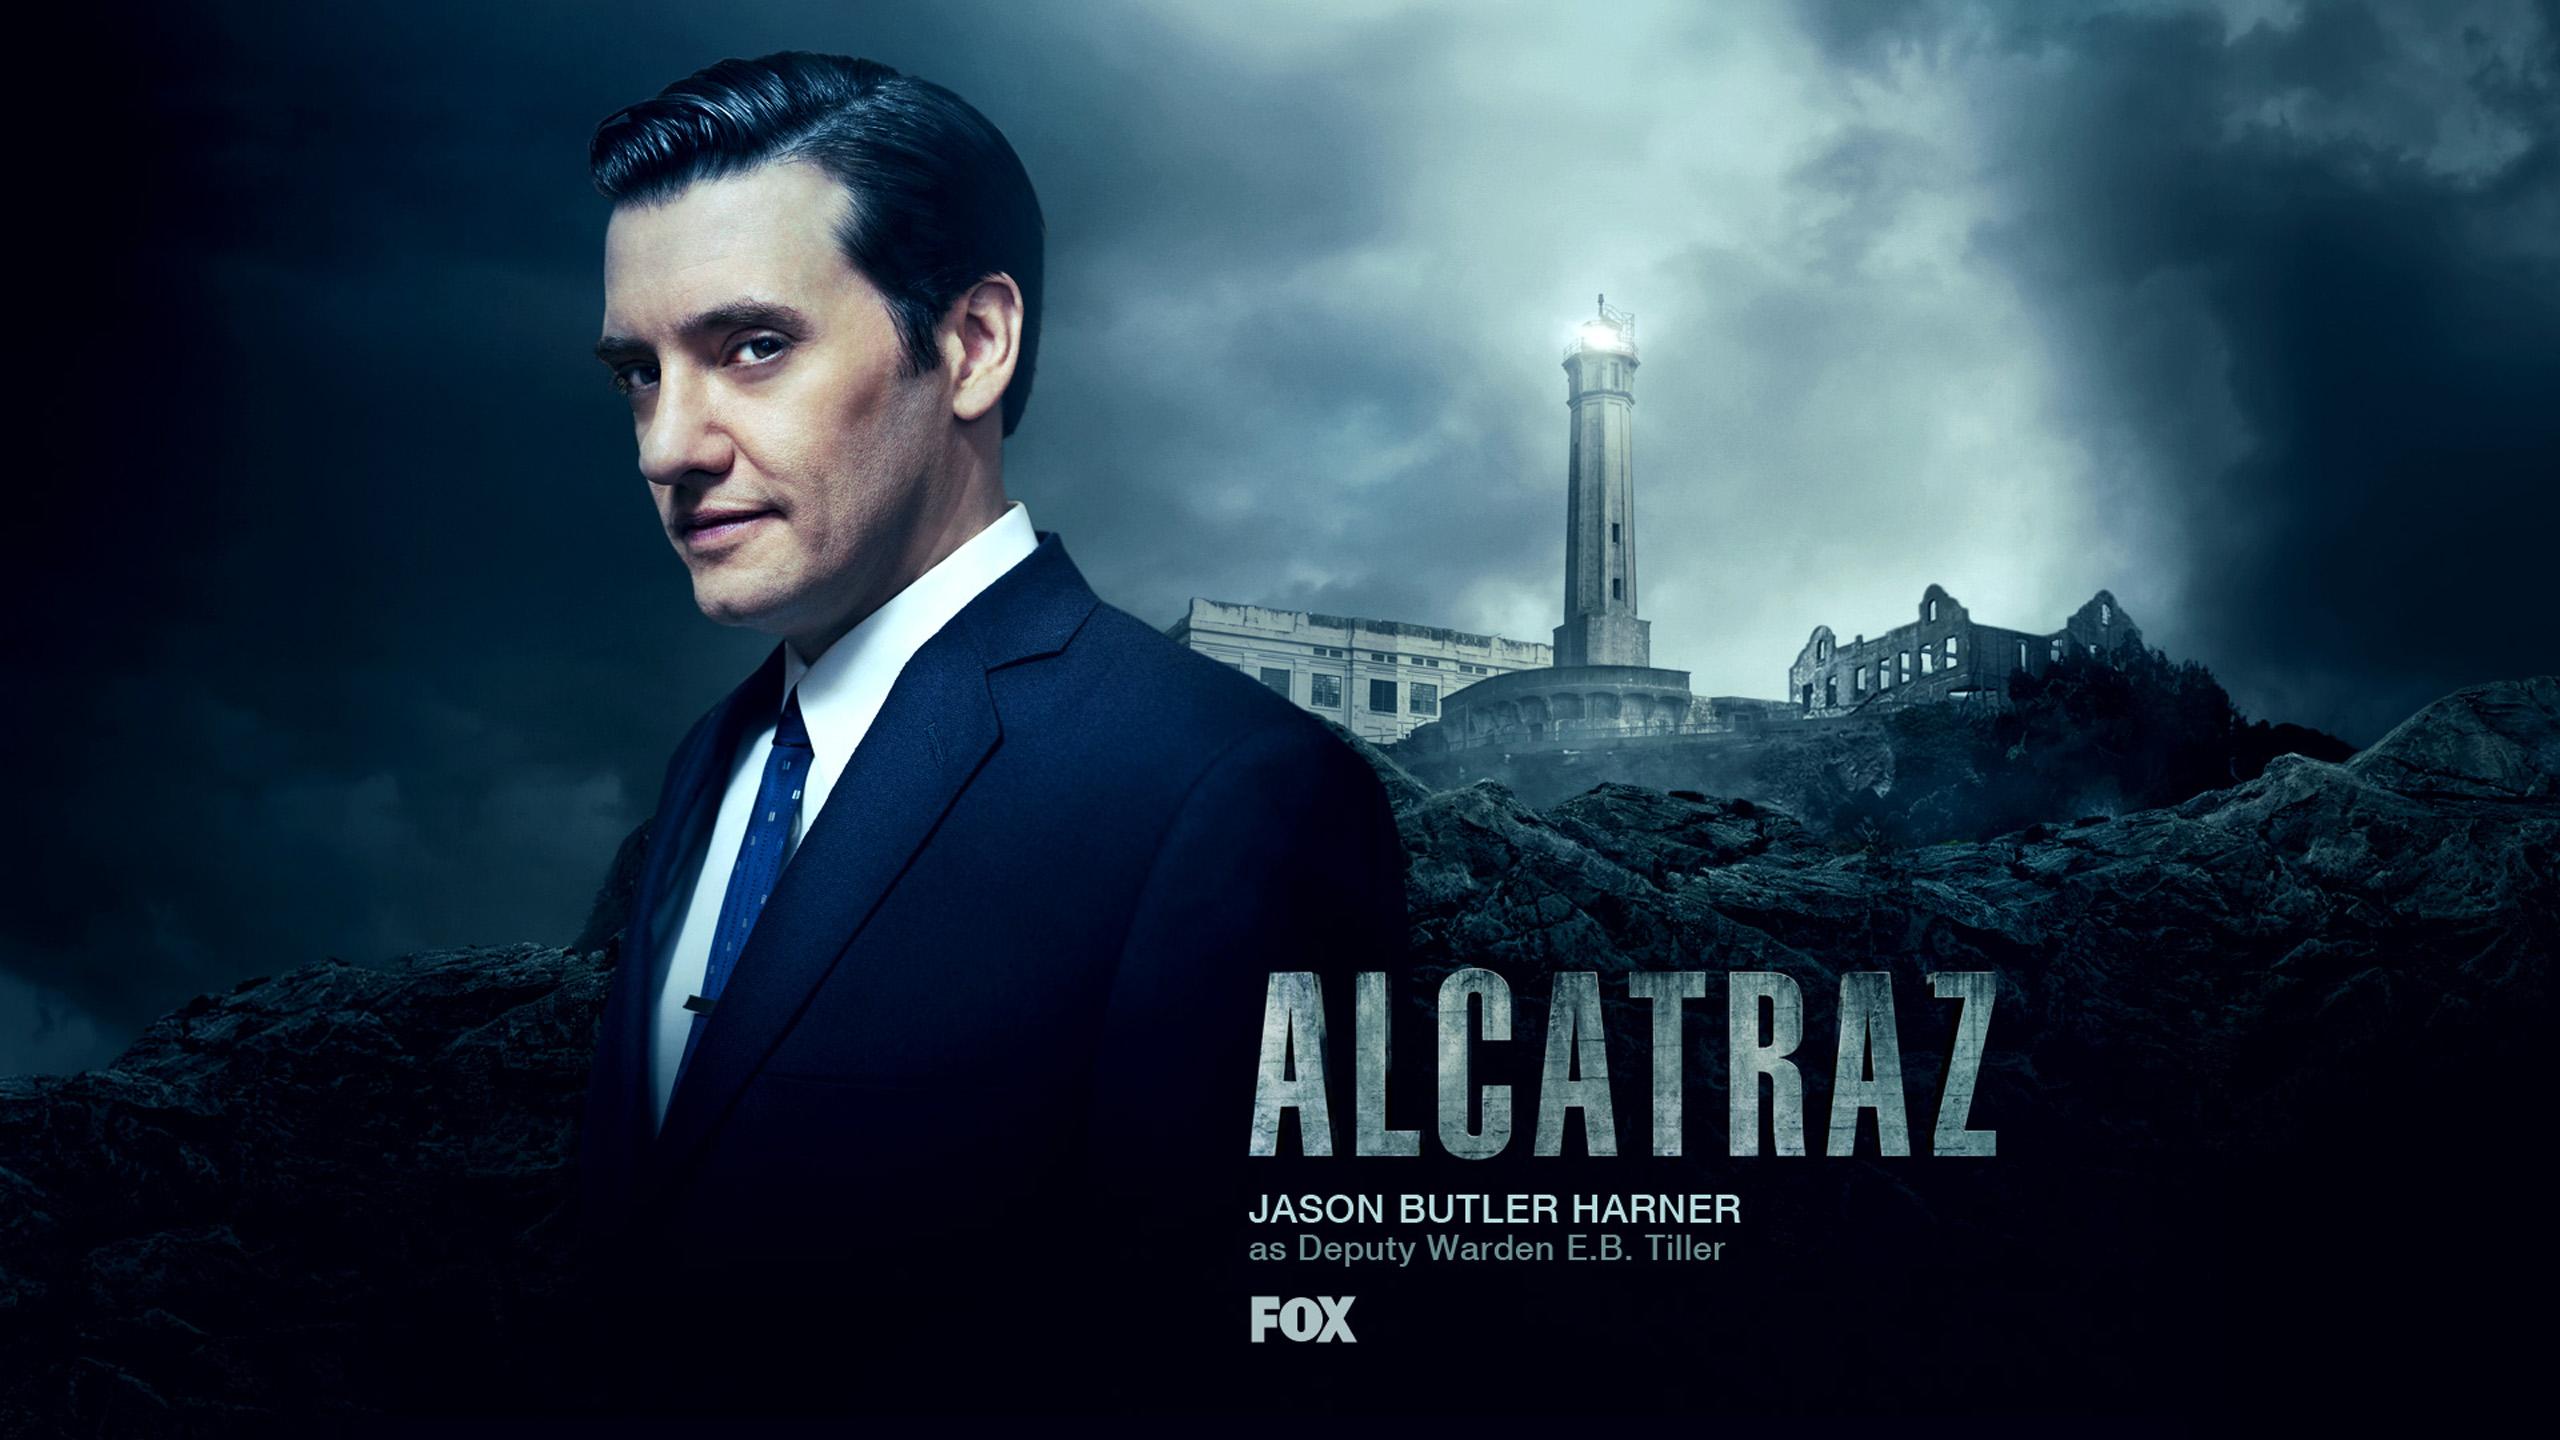 21968_alcatraz_wallpaper_06_122_227lo.jpg